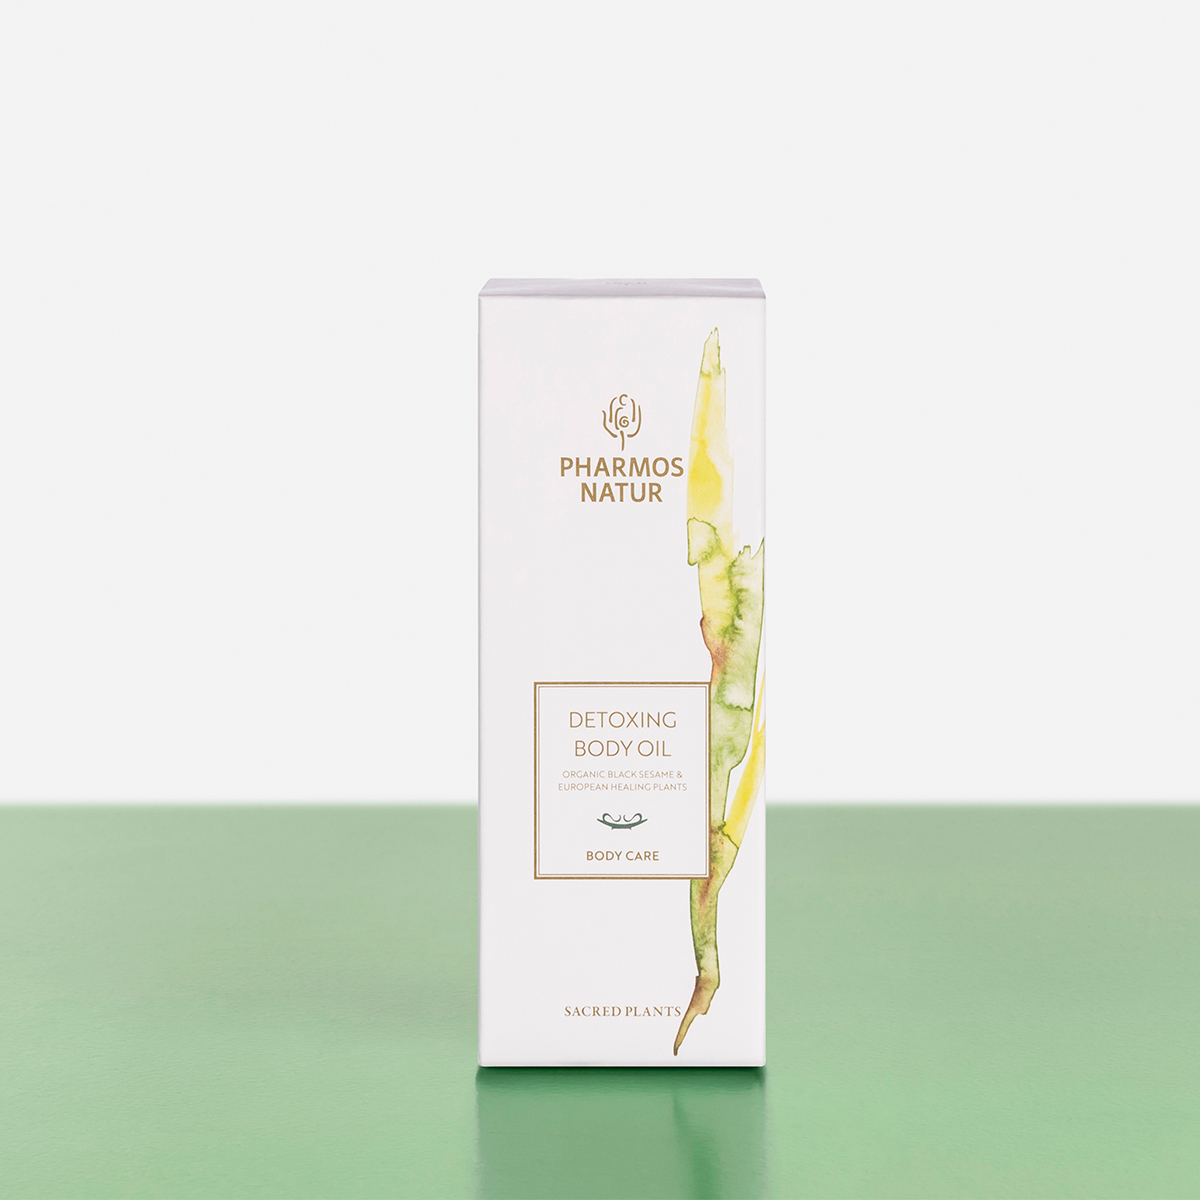 Verpackung Detoxing Body Oil Produktbild